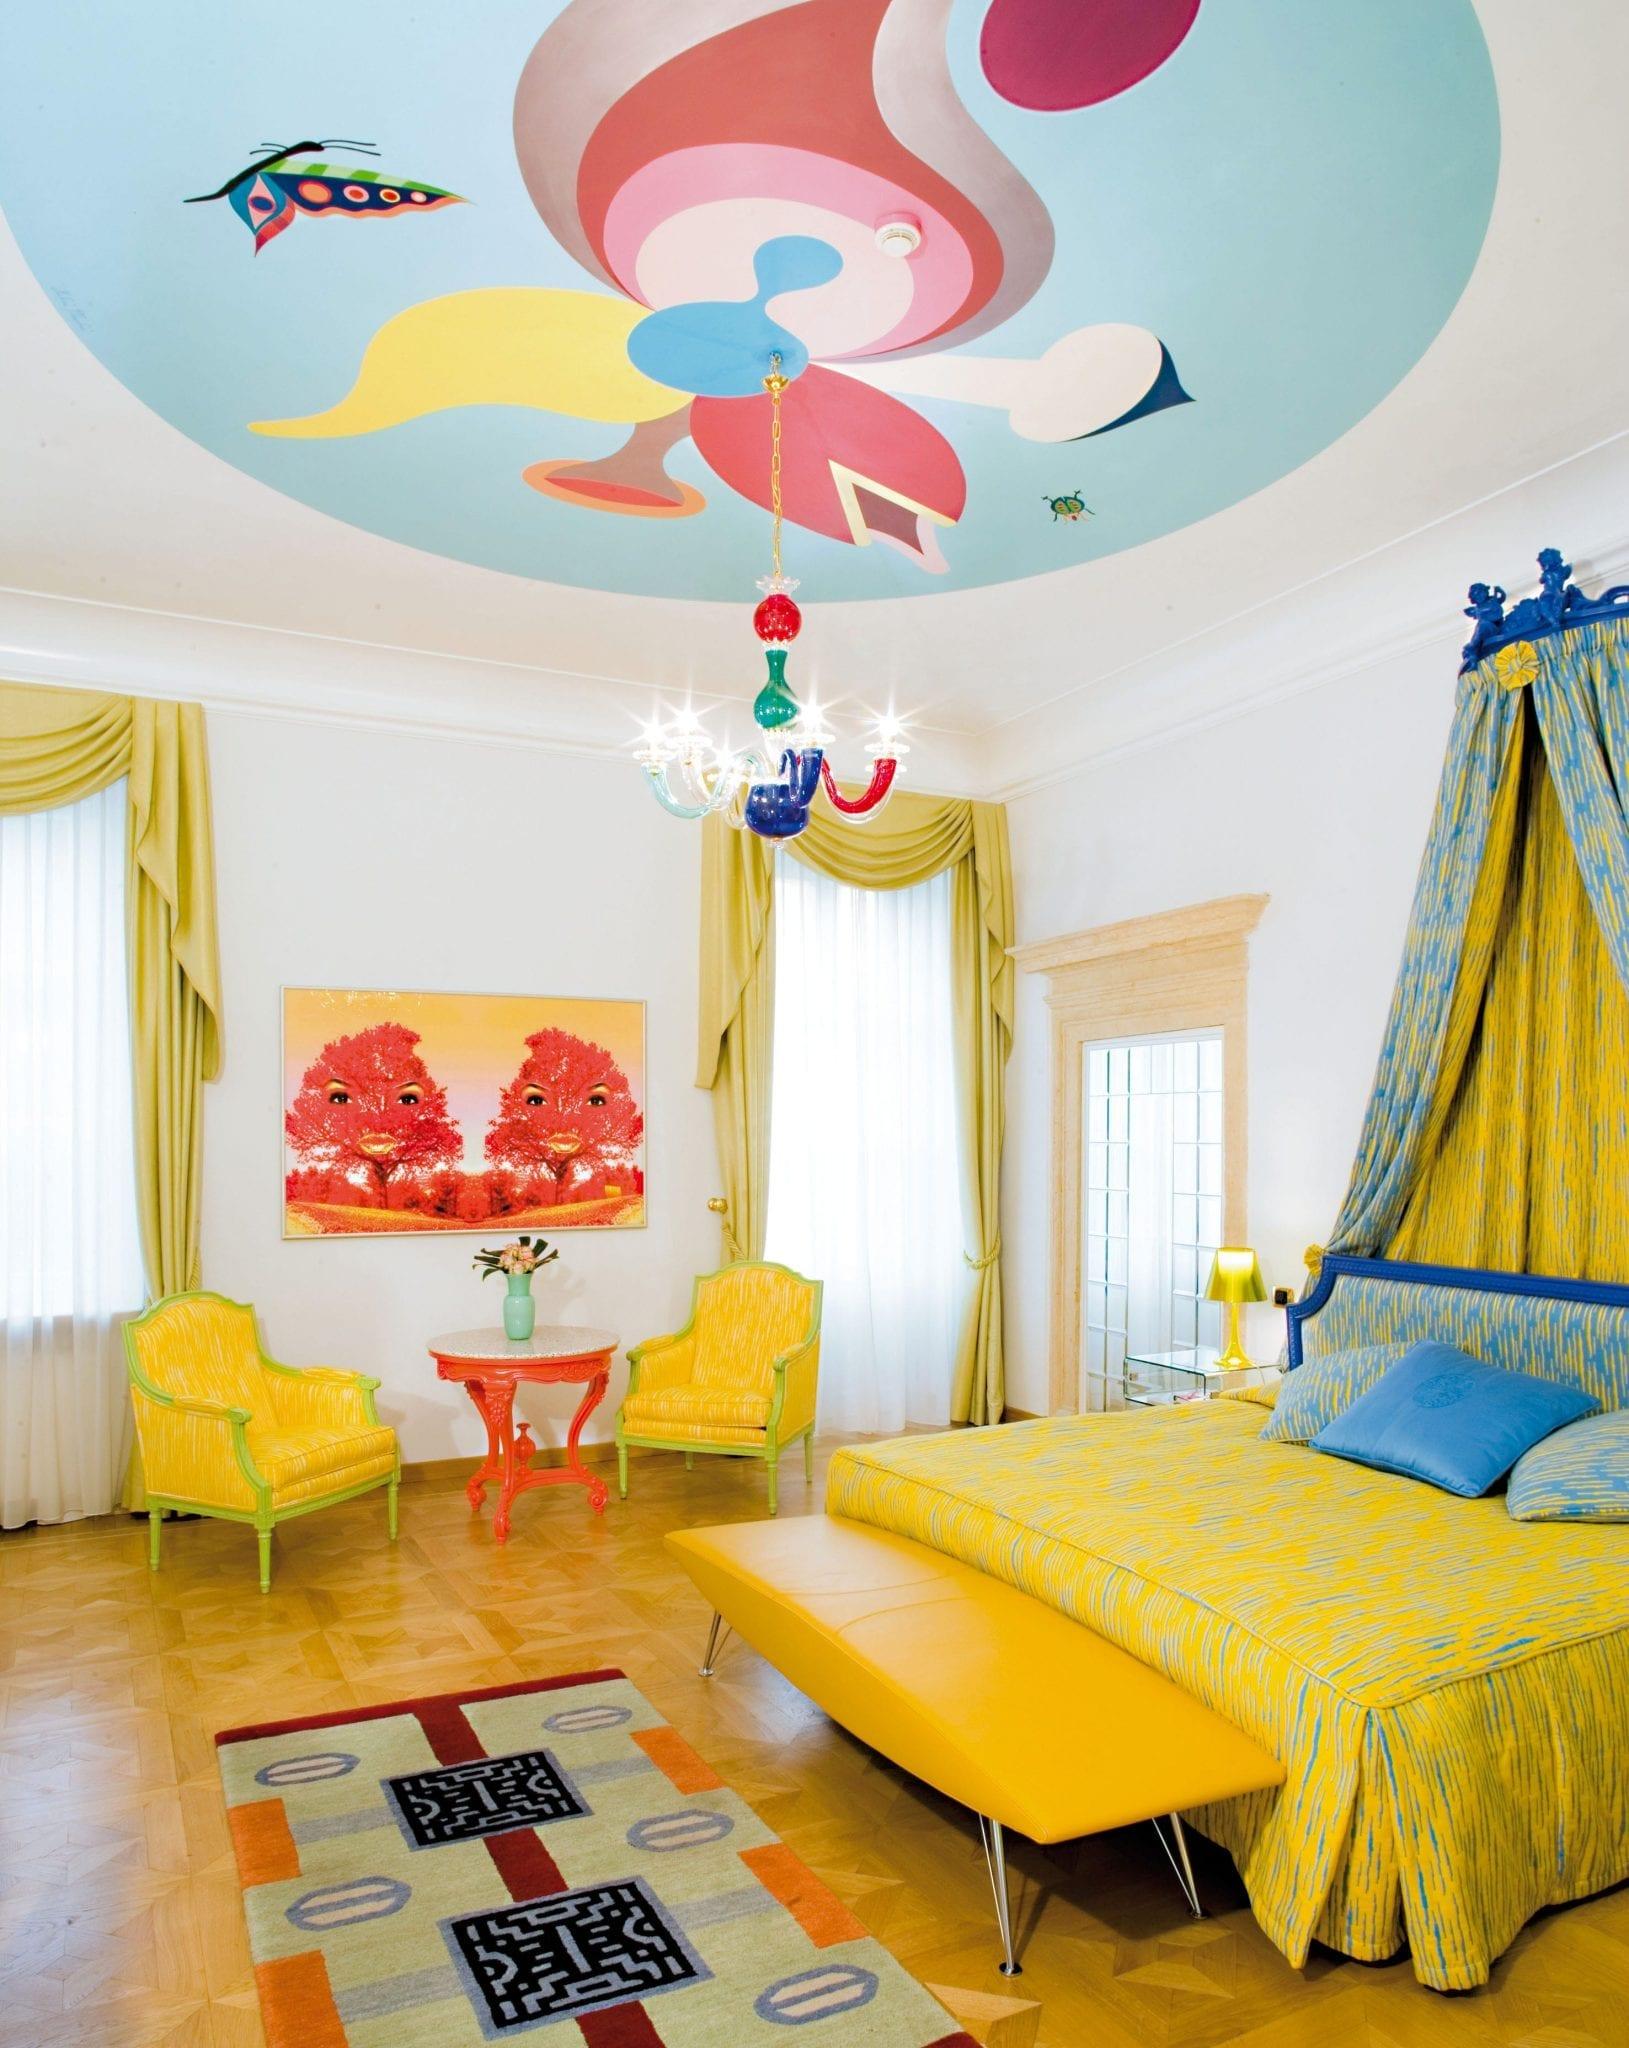 Byblos Art Hotel Villa Amista in Verona, Italy